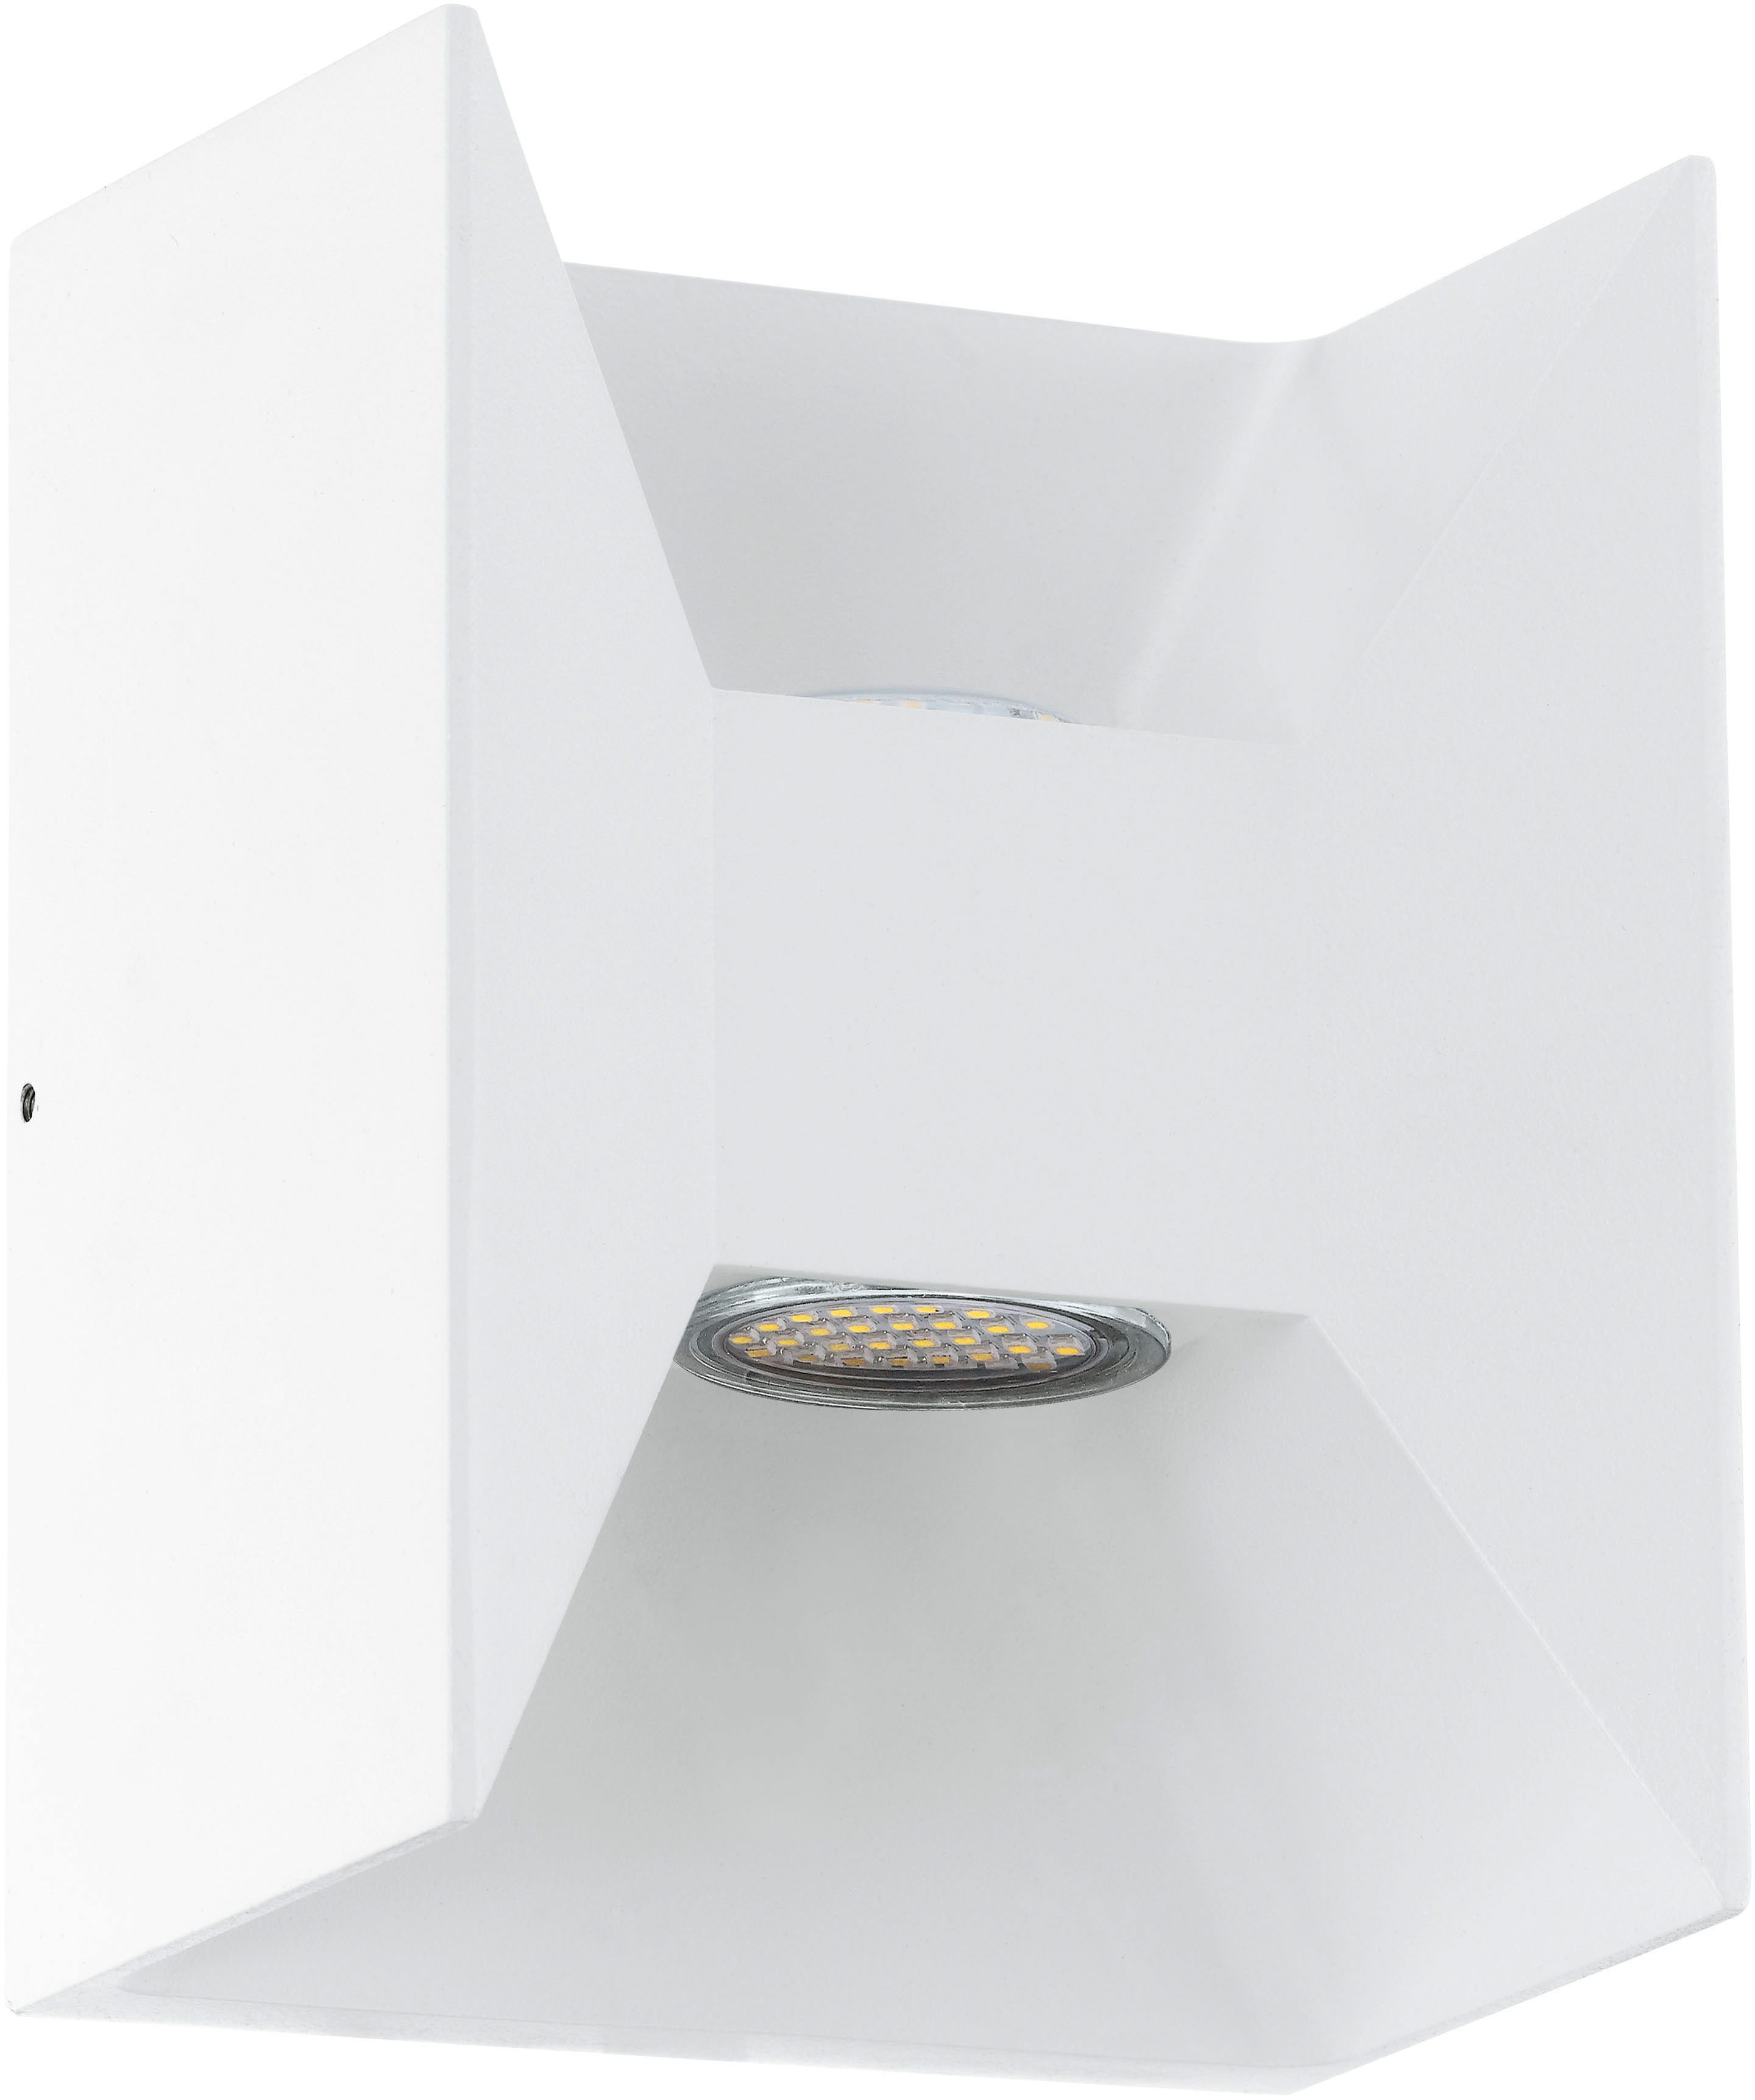 EGLO,LED Außen-Wandleuchte Morino